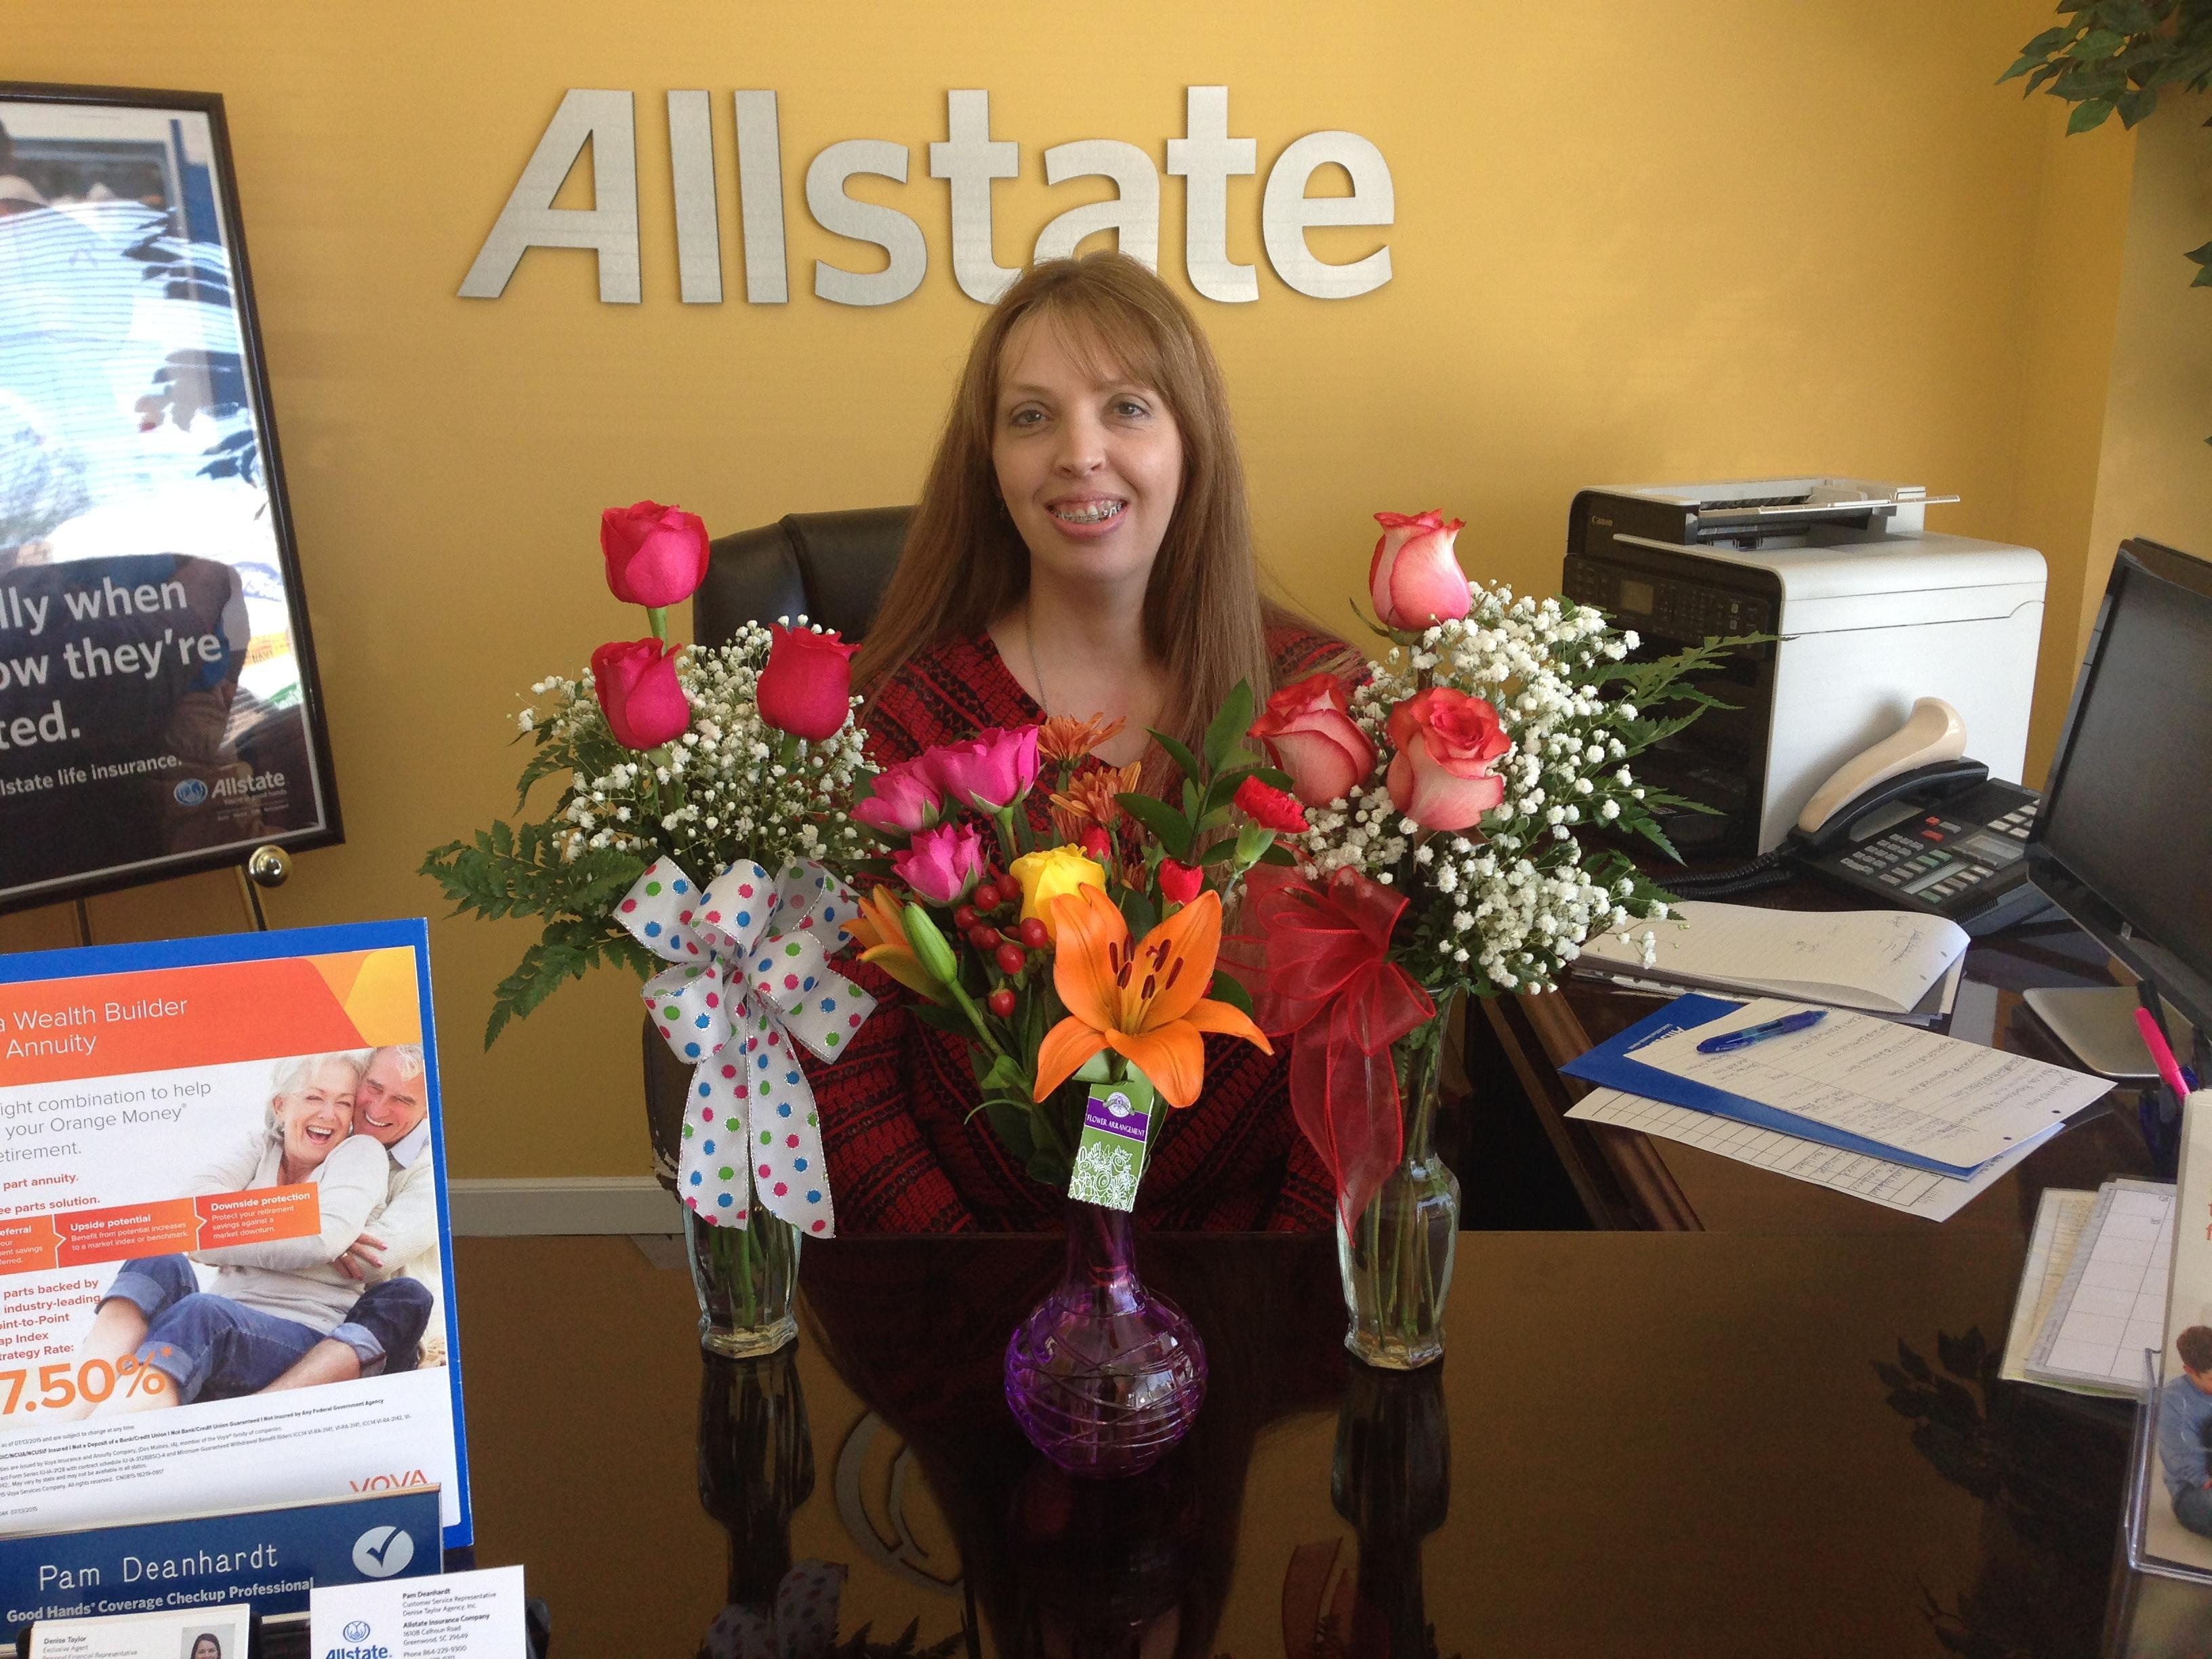 Allstate | Car Insurance in Greenwood, SC - Denise Taylor